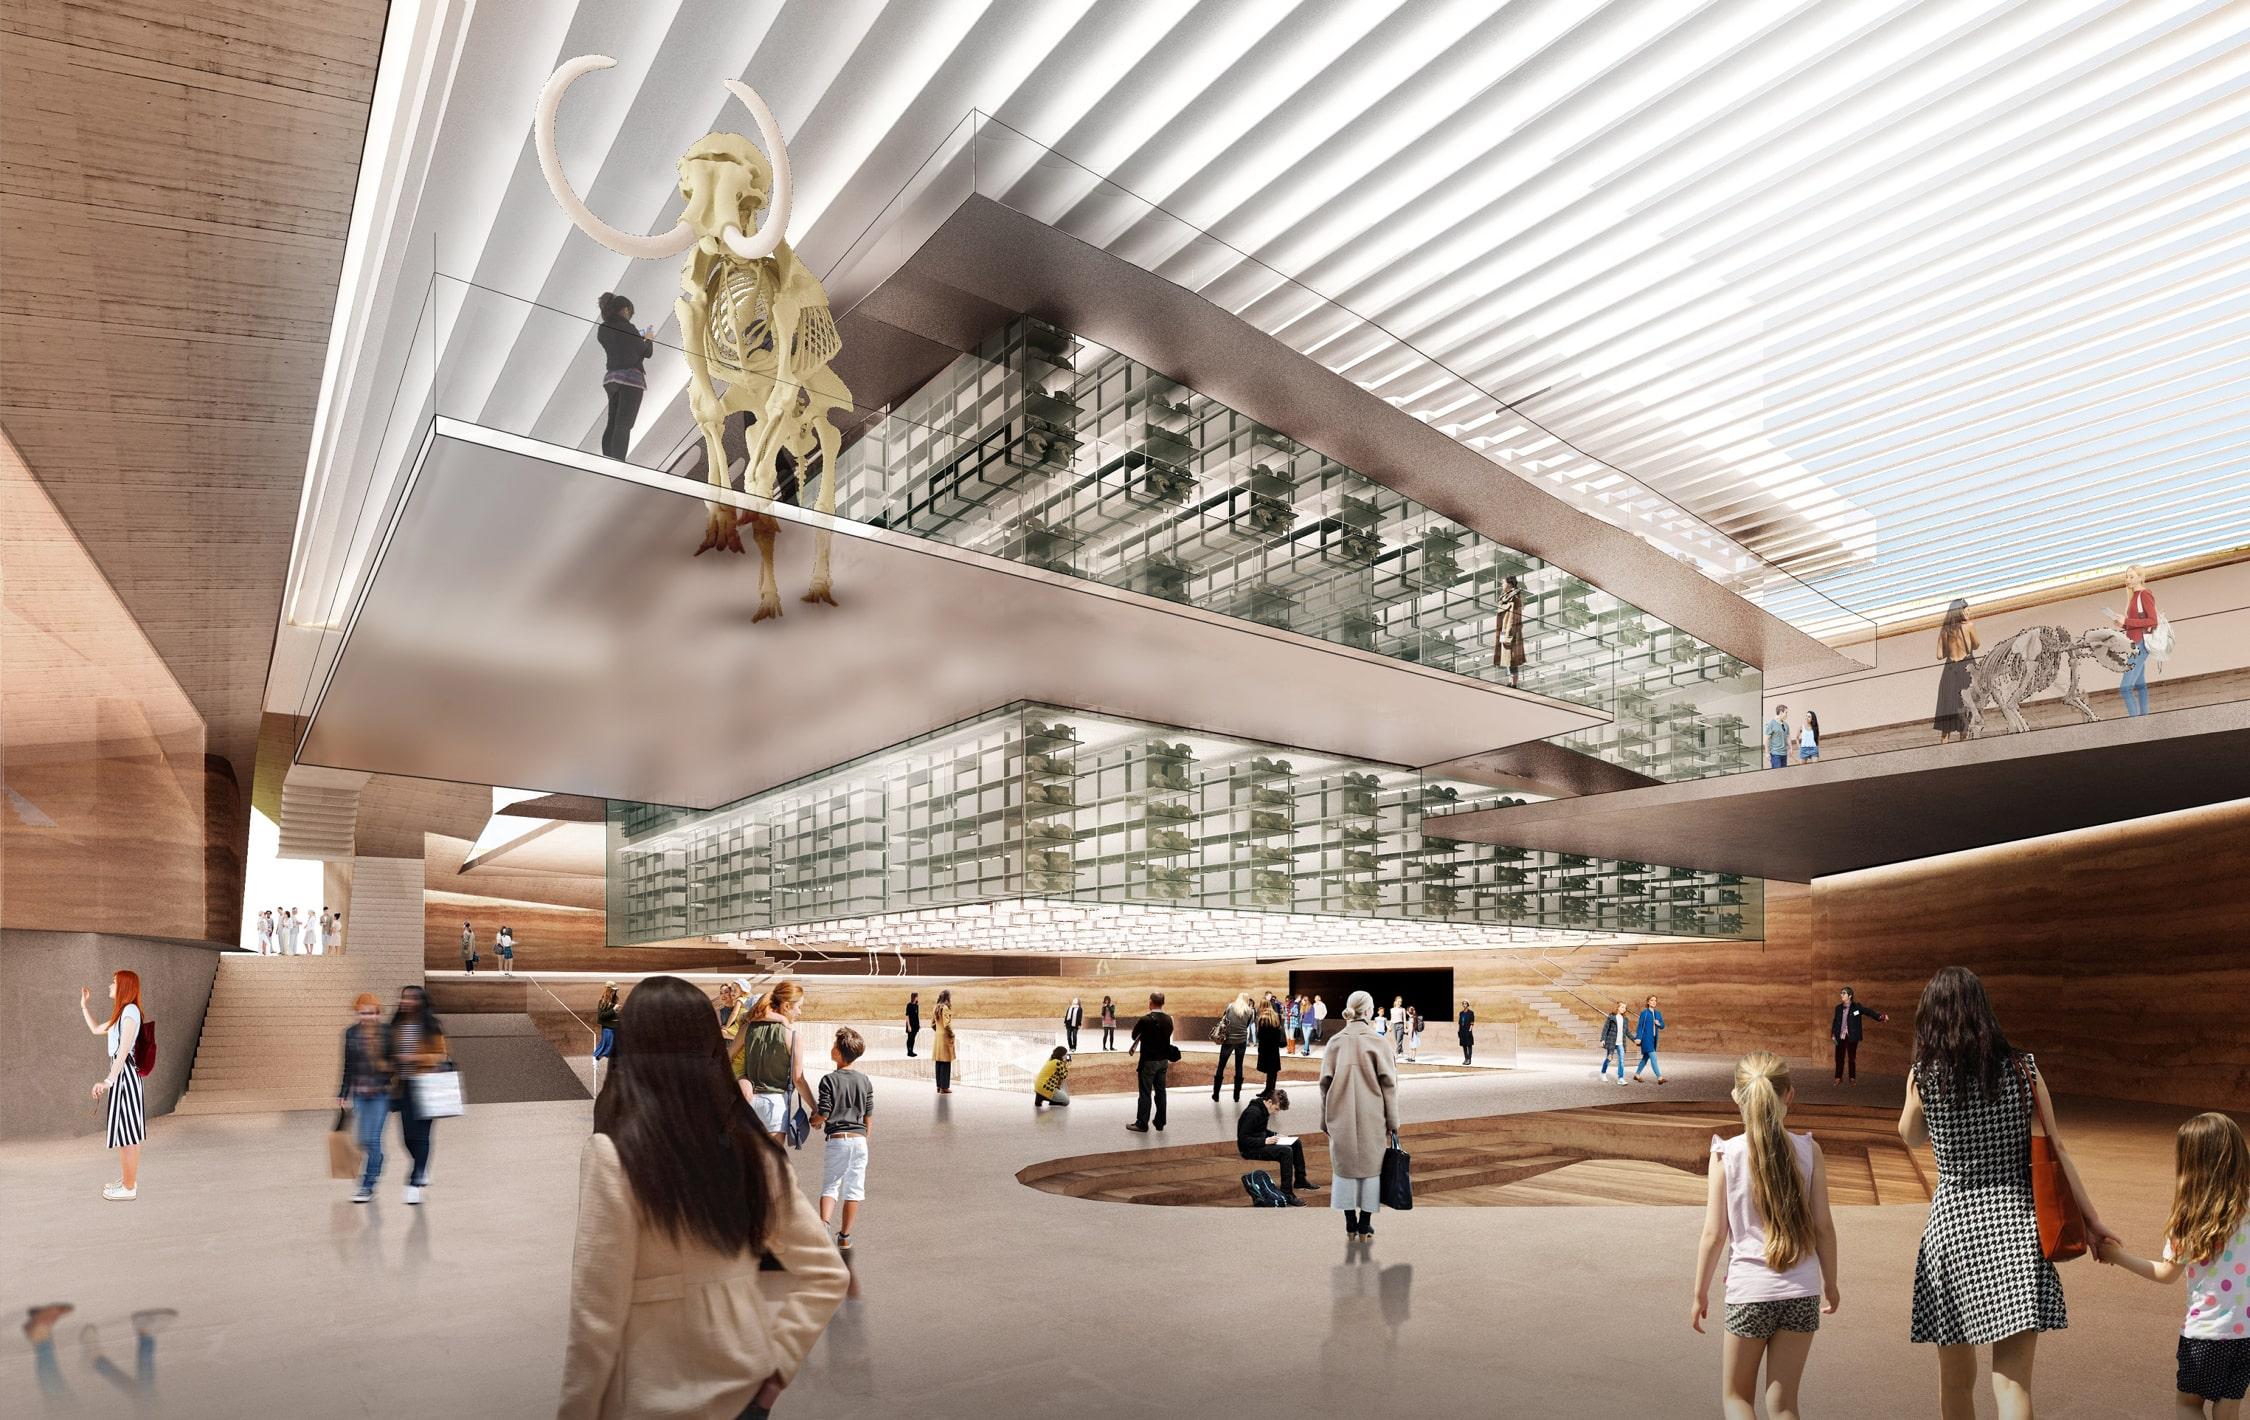 Lobby view of Weiss Manfredi's La Brea Tar Pits proposal